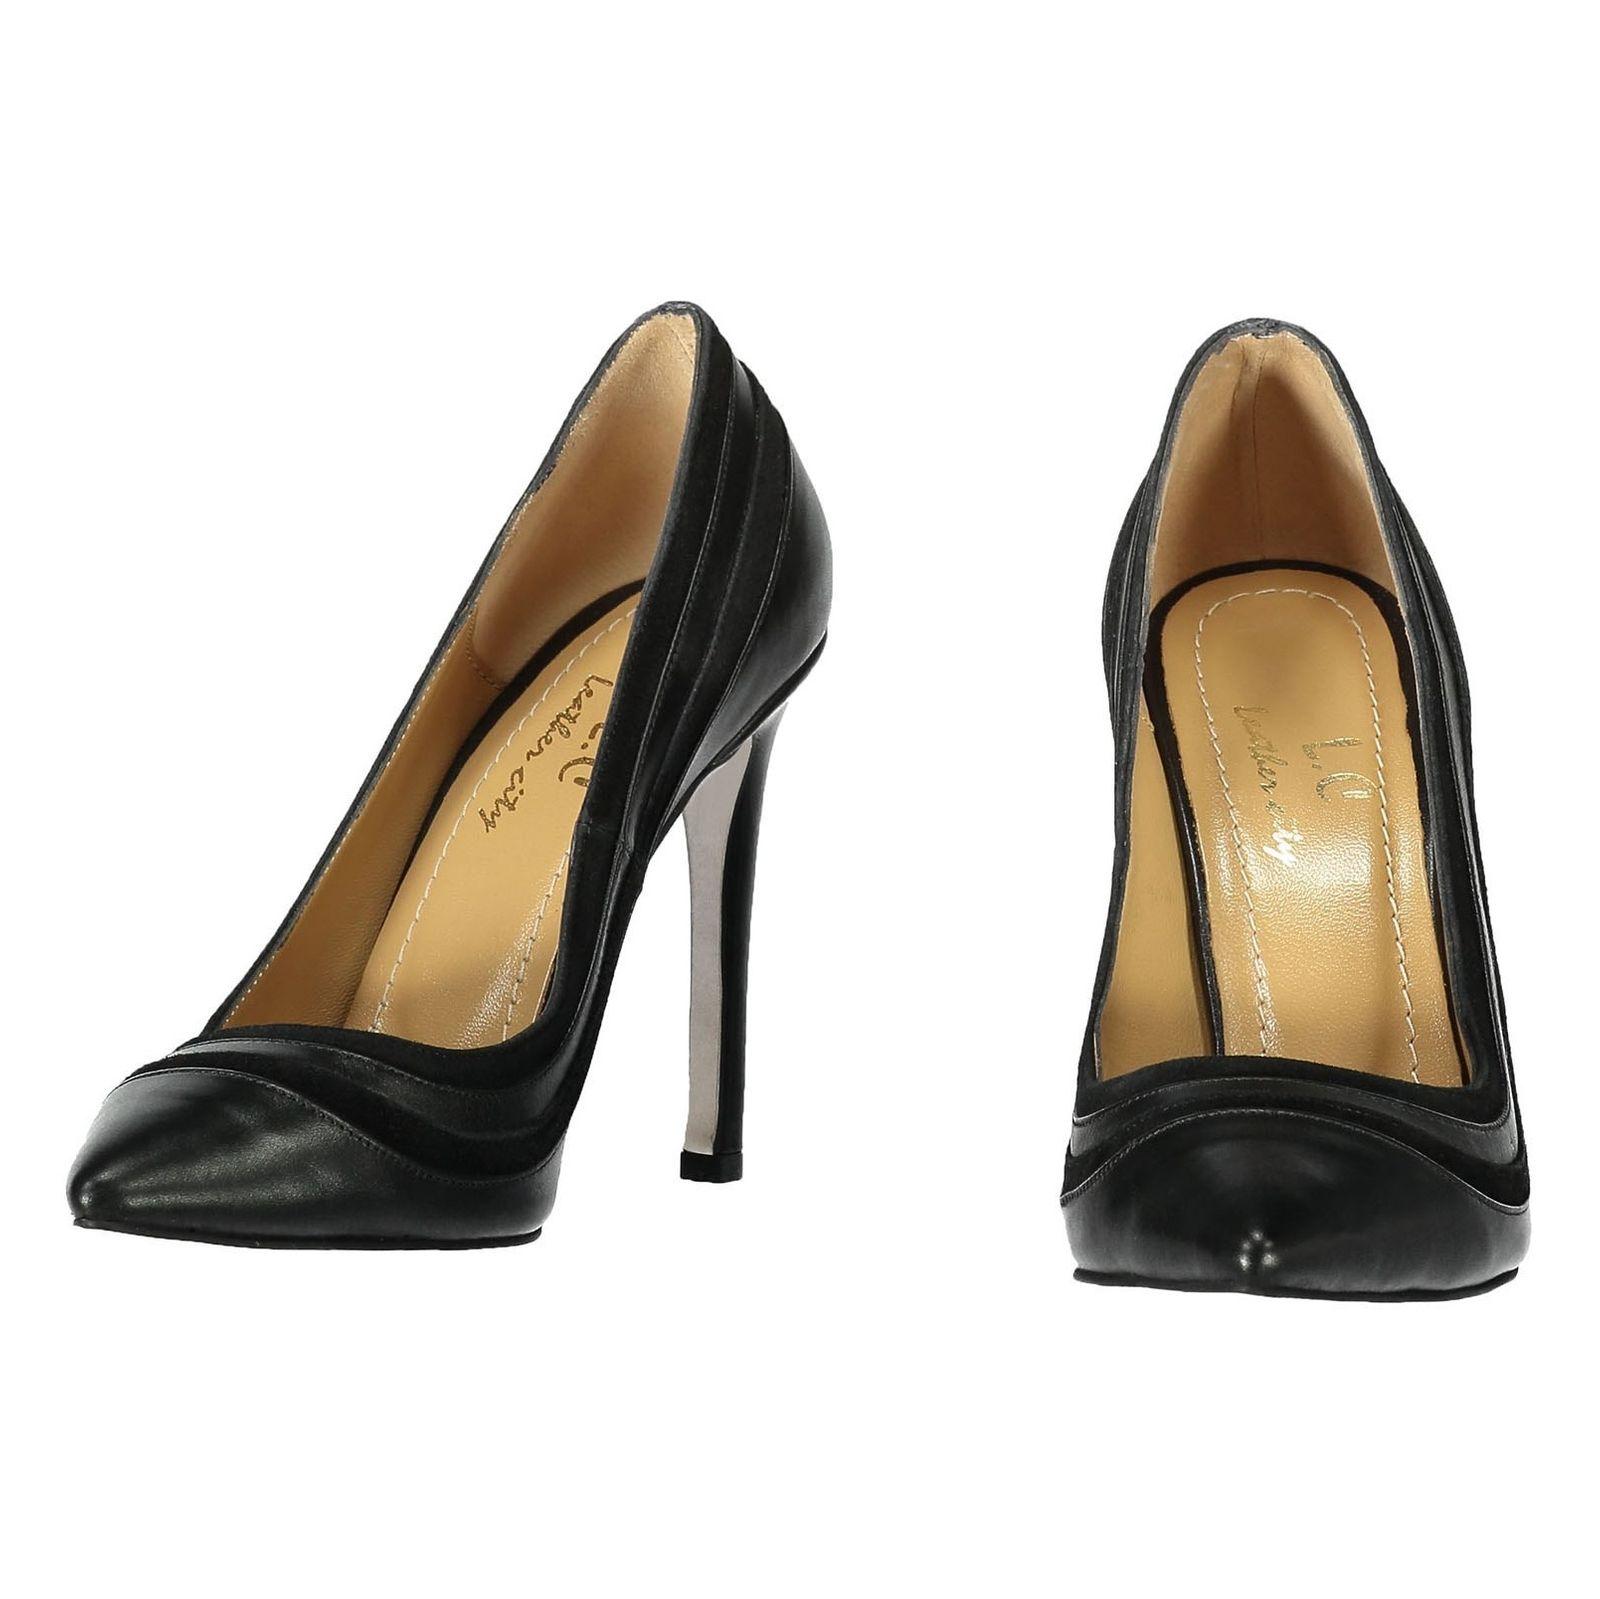 کفش پاشنه بلند چرم زنانه - شهر چرم - قهوه اي تيرهق - 4